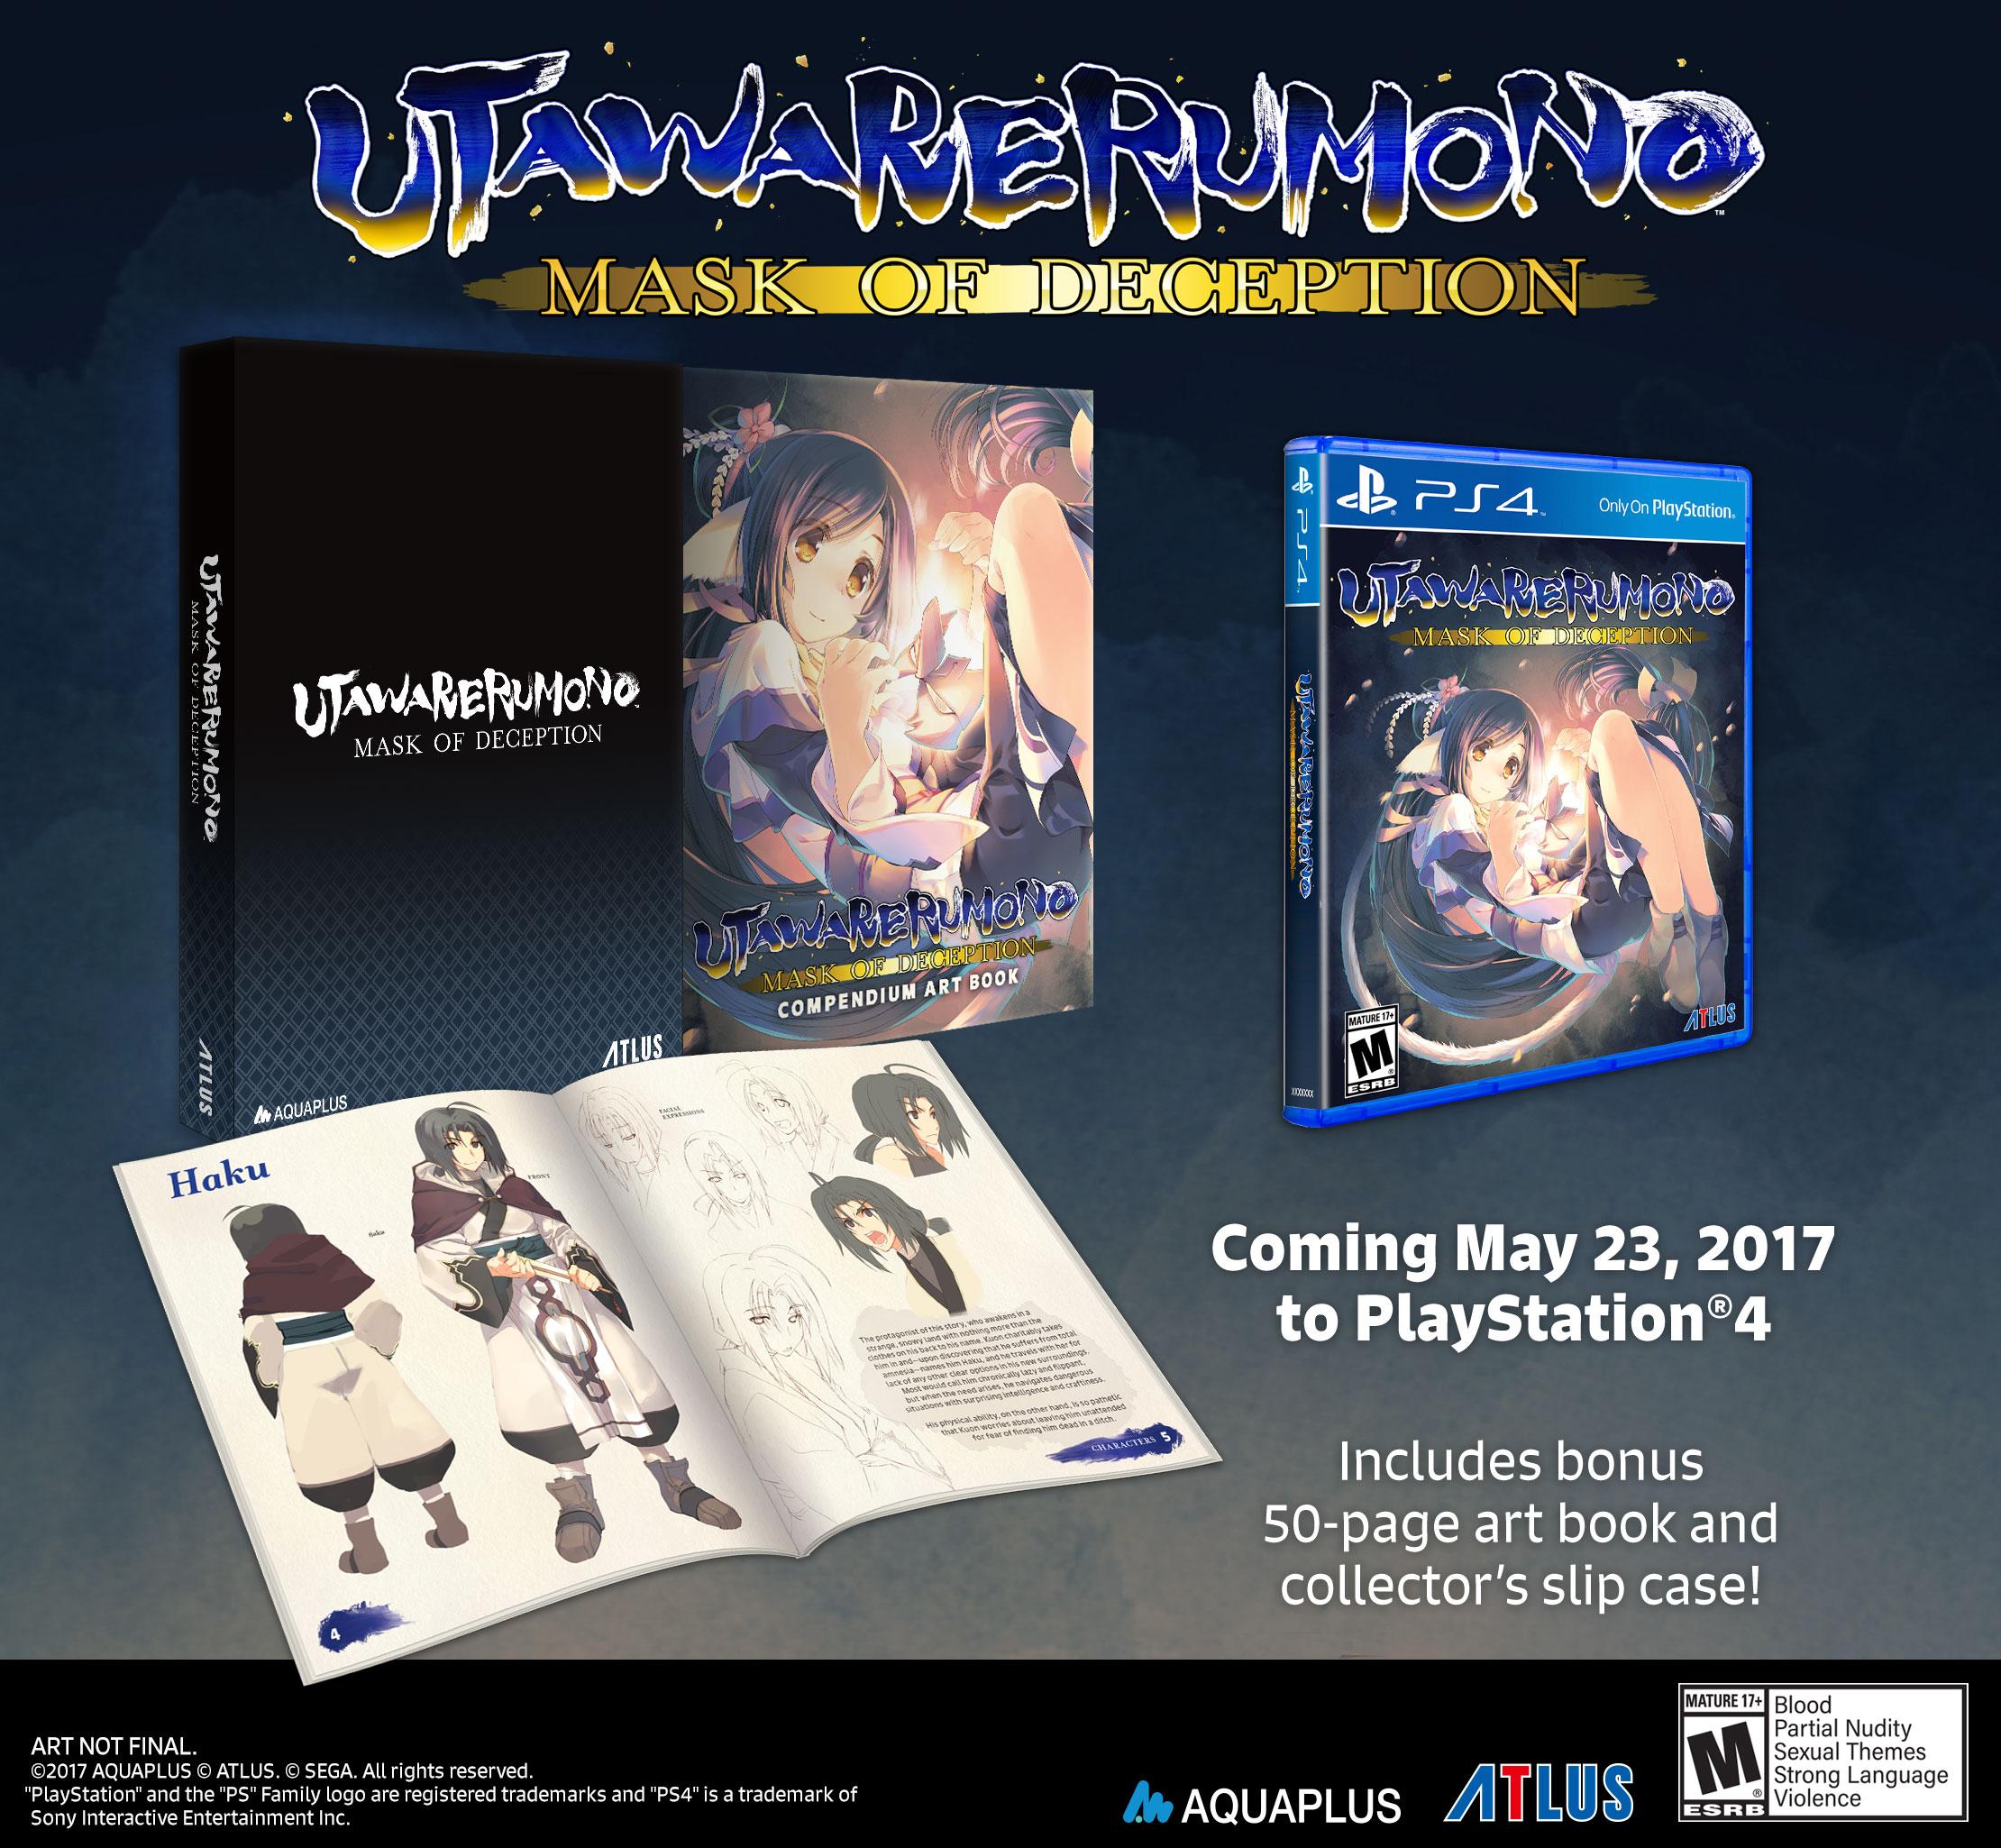 Utawarerumono-Mask-of-Deception_2017_03-08-17_001